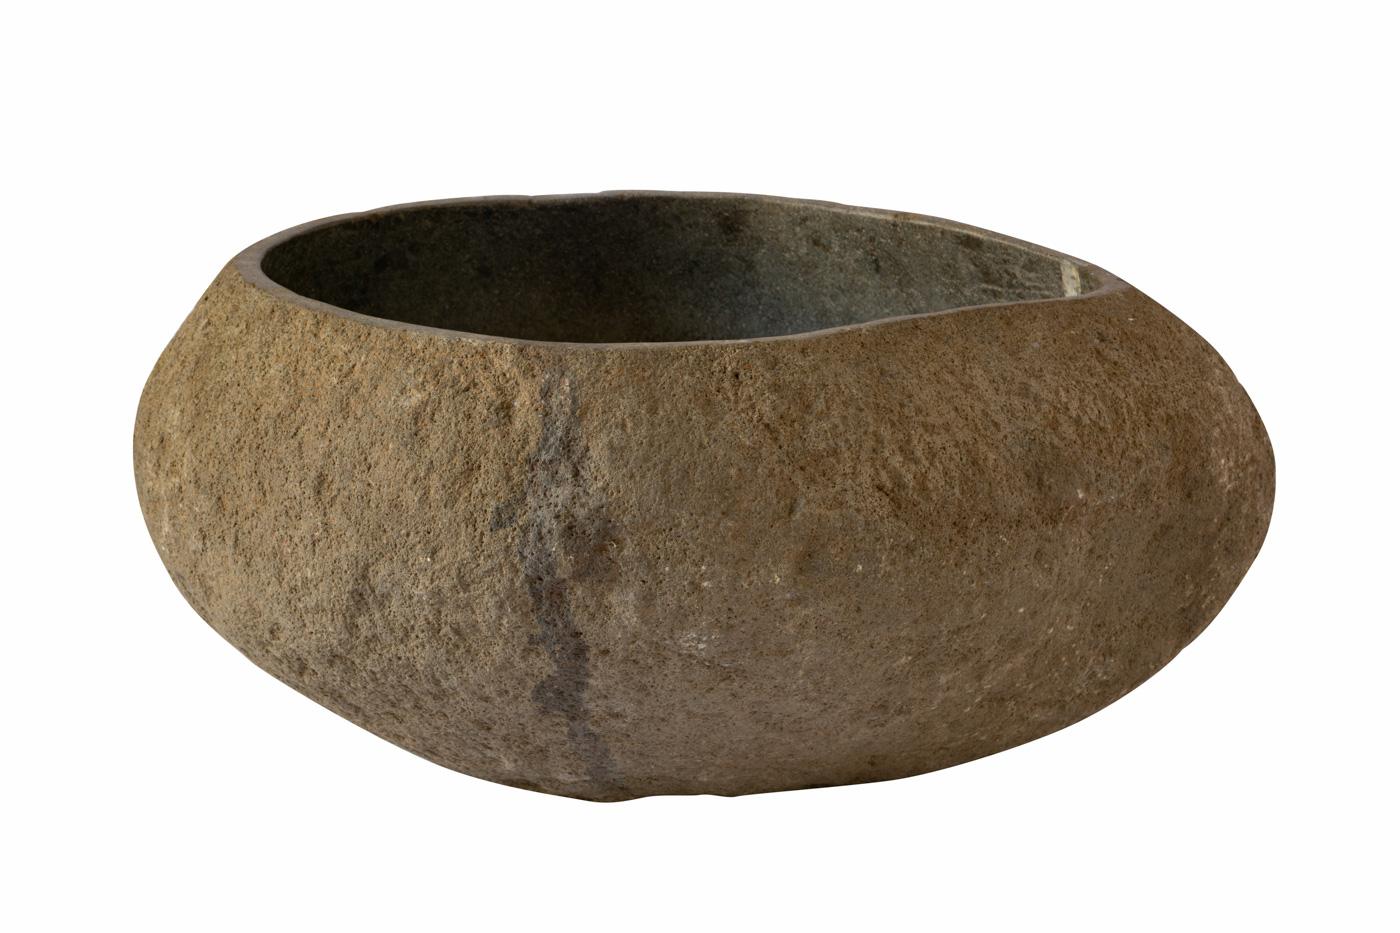 Round pot in stone